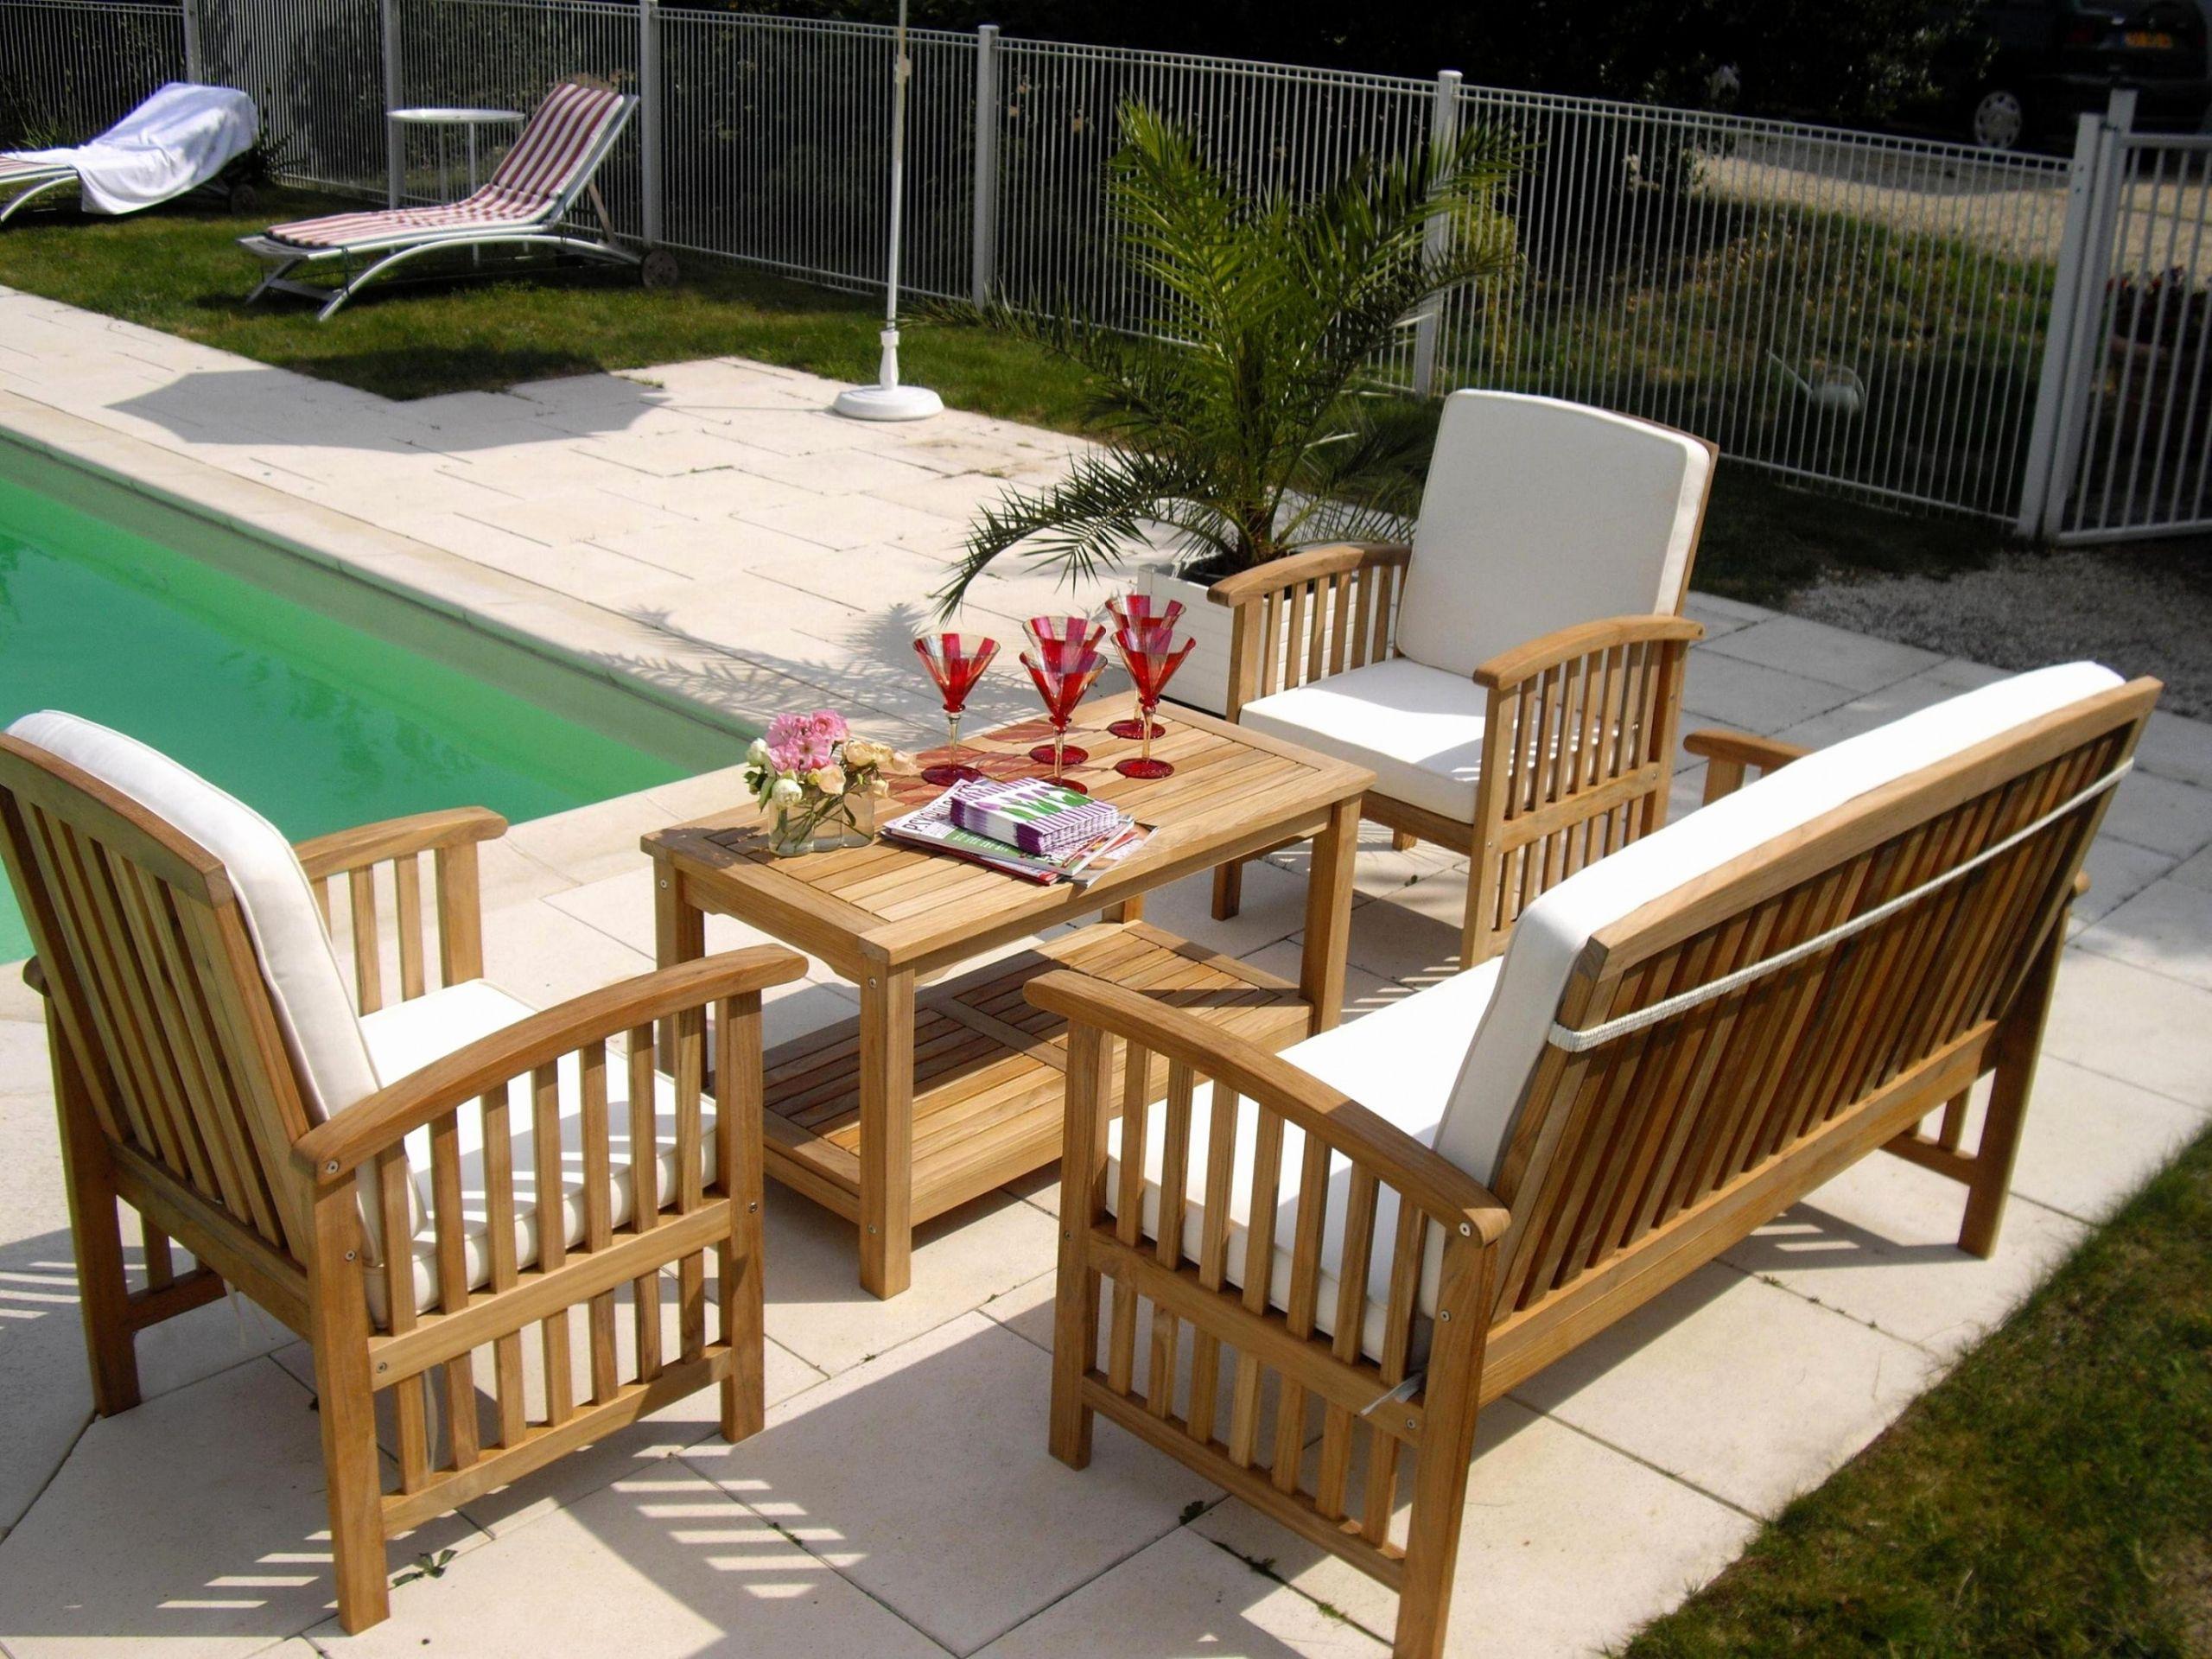 mobilier jardin bois salon de jardin bois leclerc mobilier de jardin petit of mobilier jardin bois scaled